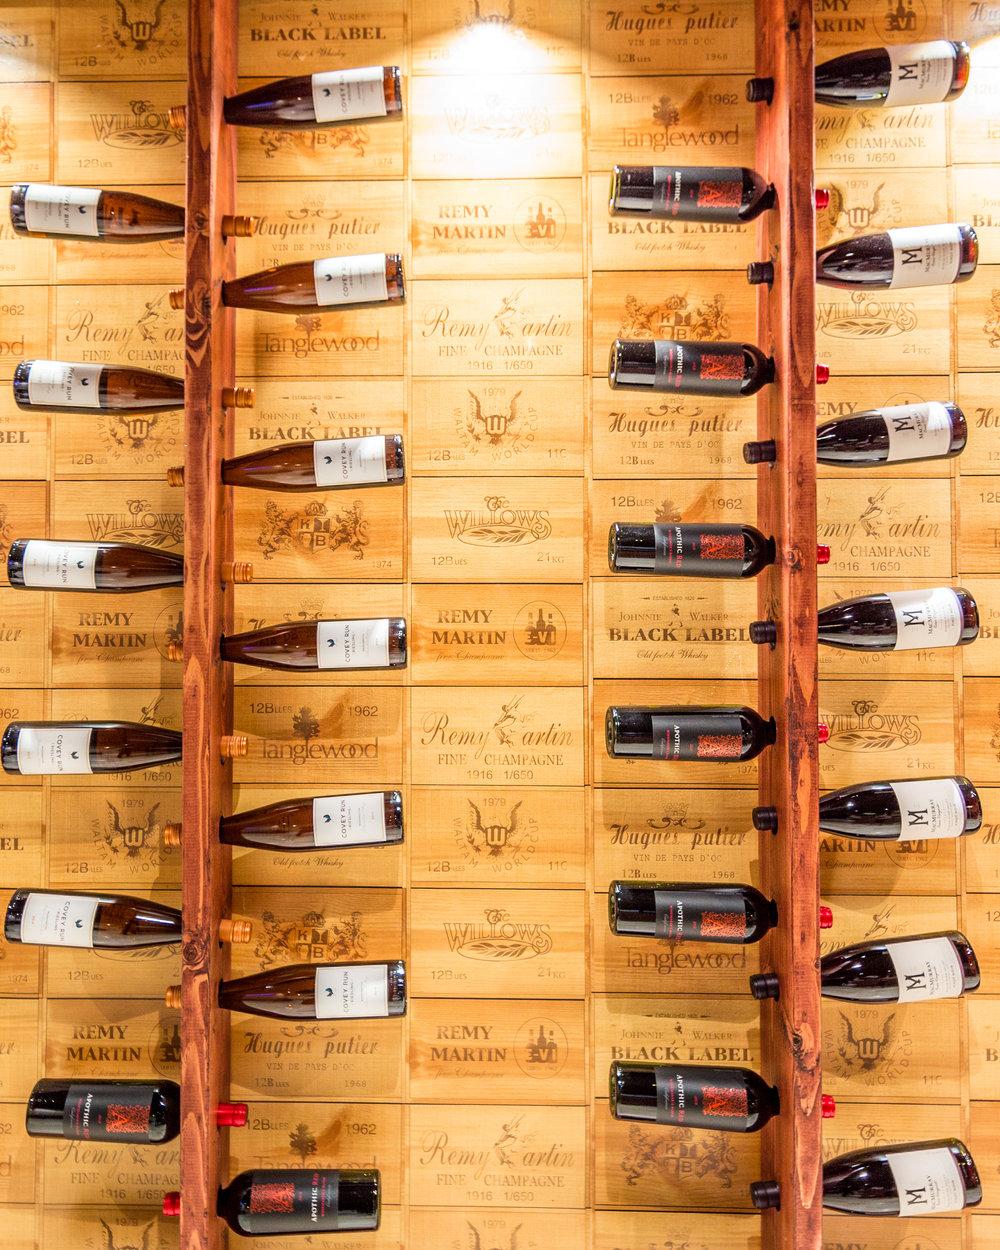 weddings-events-wilshire-caterers-wine-cellar.jpg